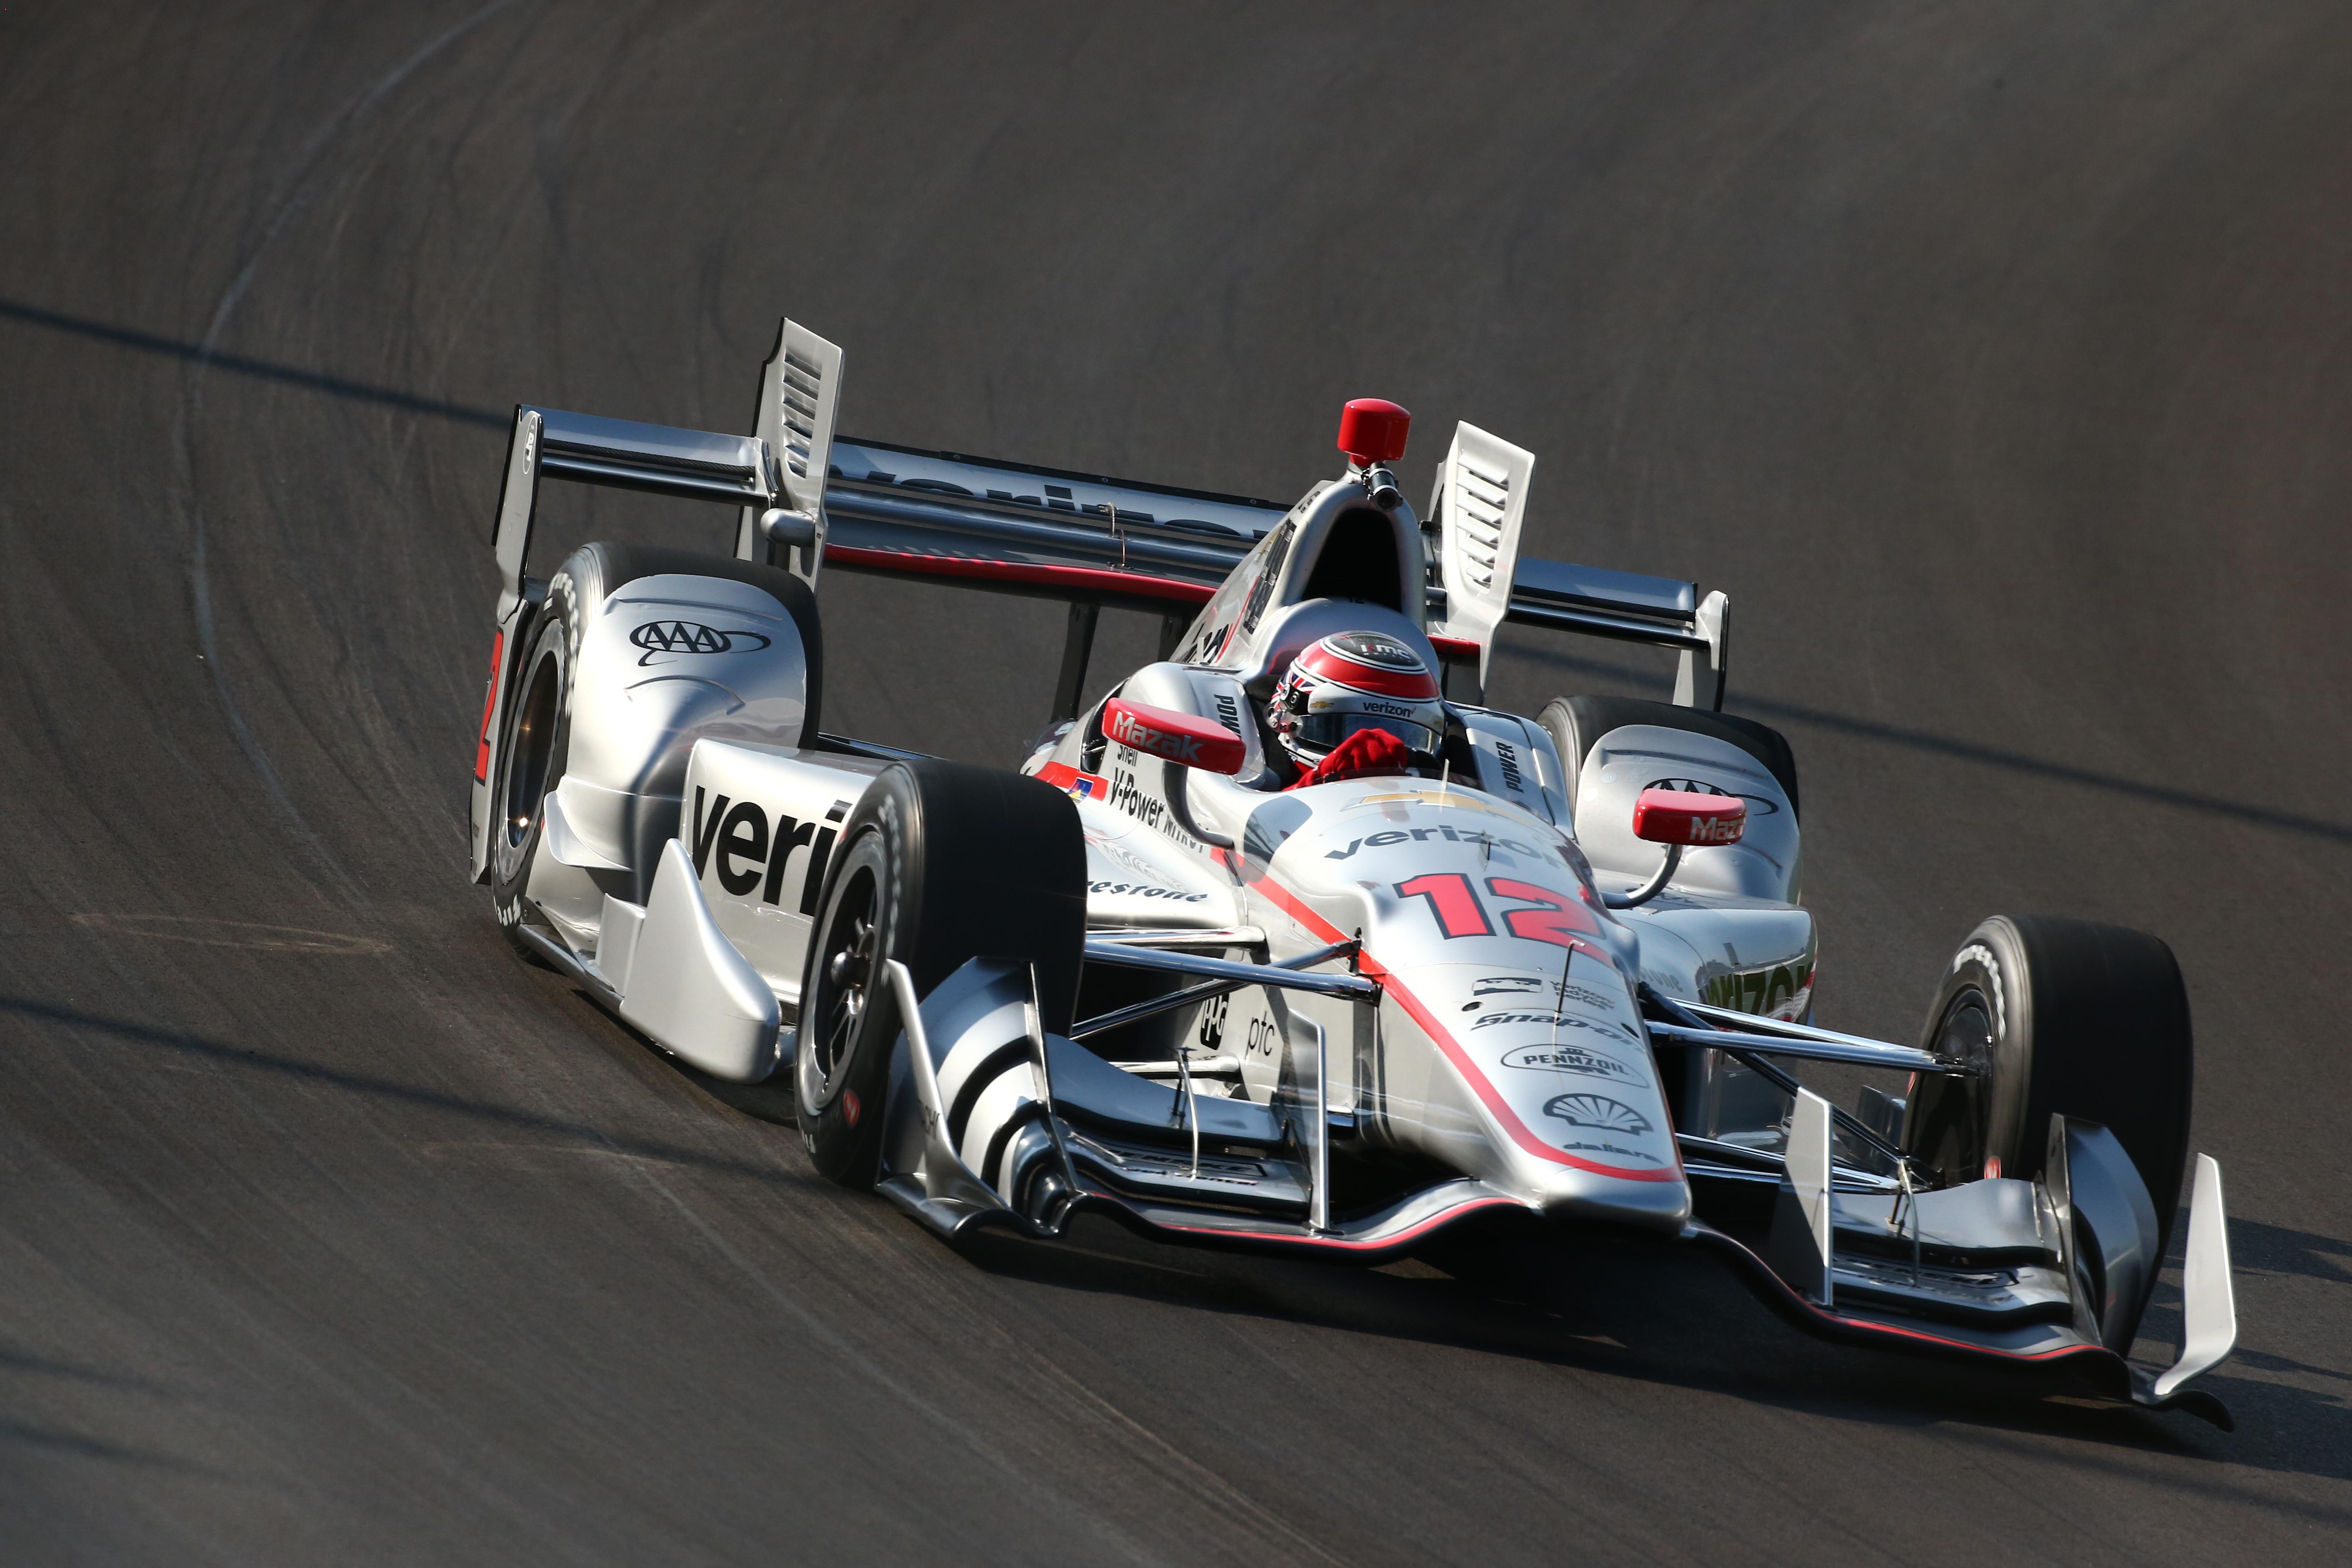 Will Power 50th pole - Verizon Indycar Series